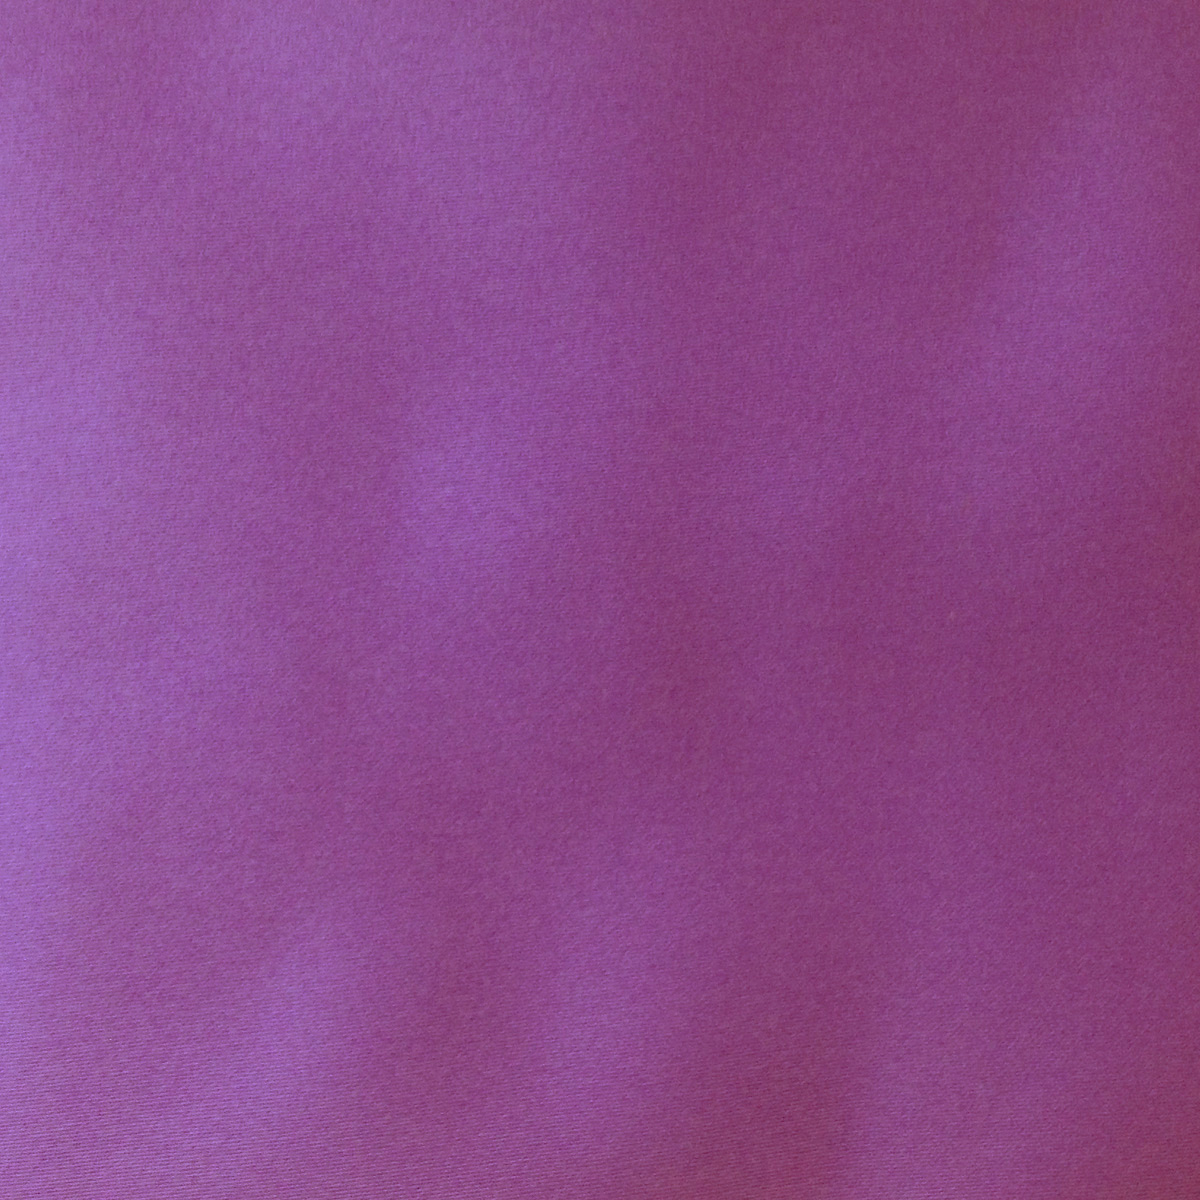 B1764 06 lilac mens ties facemasks con murphys menswear cork - - Con Murphys Menswear